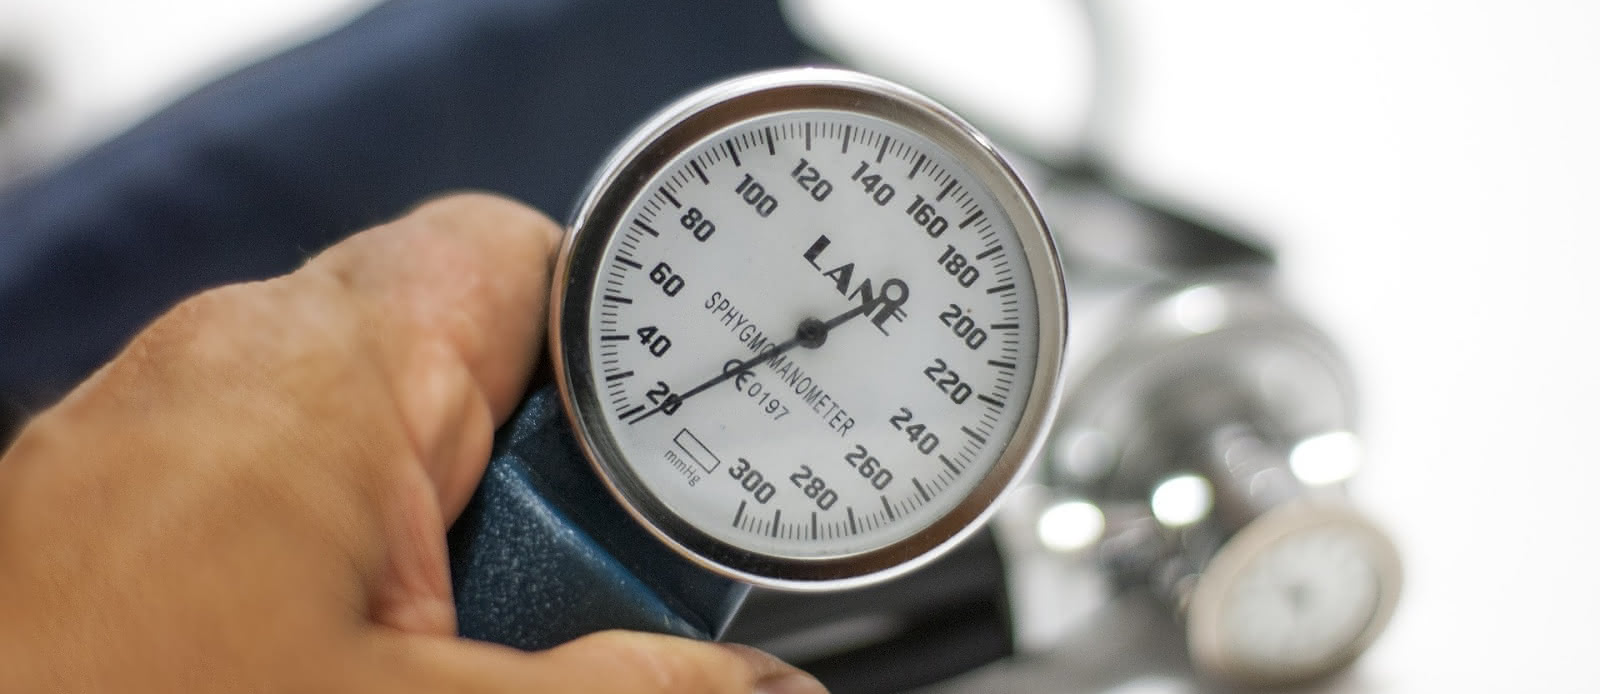 blood-pressure-monitor-3467664-1920